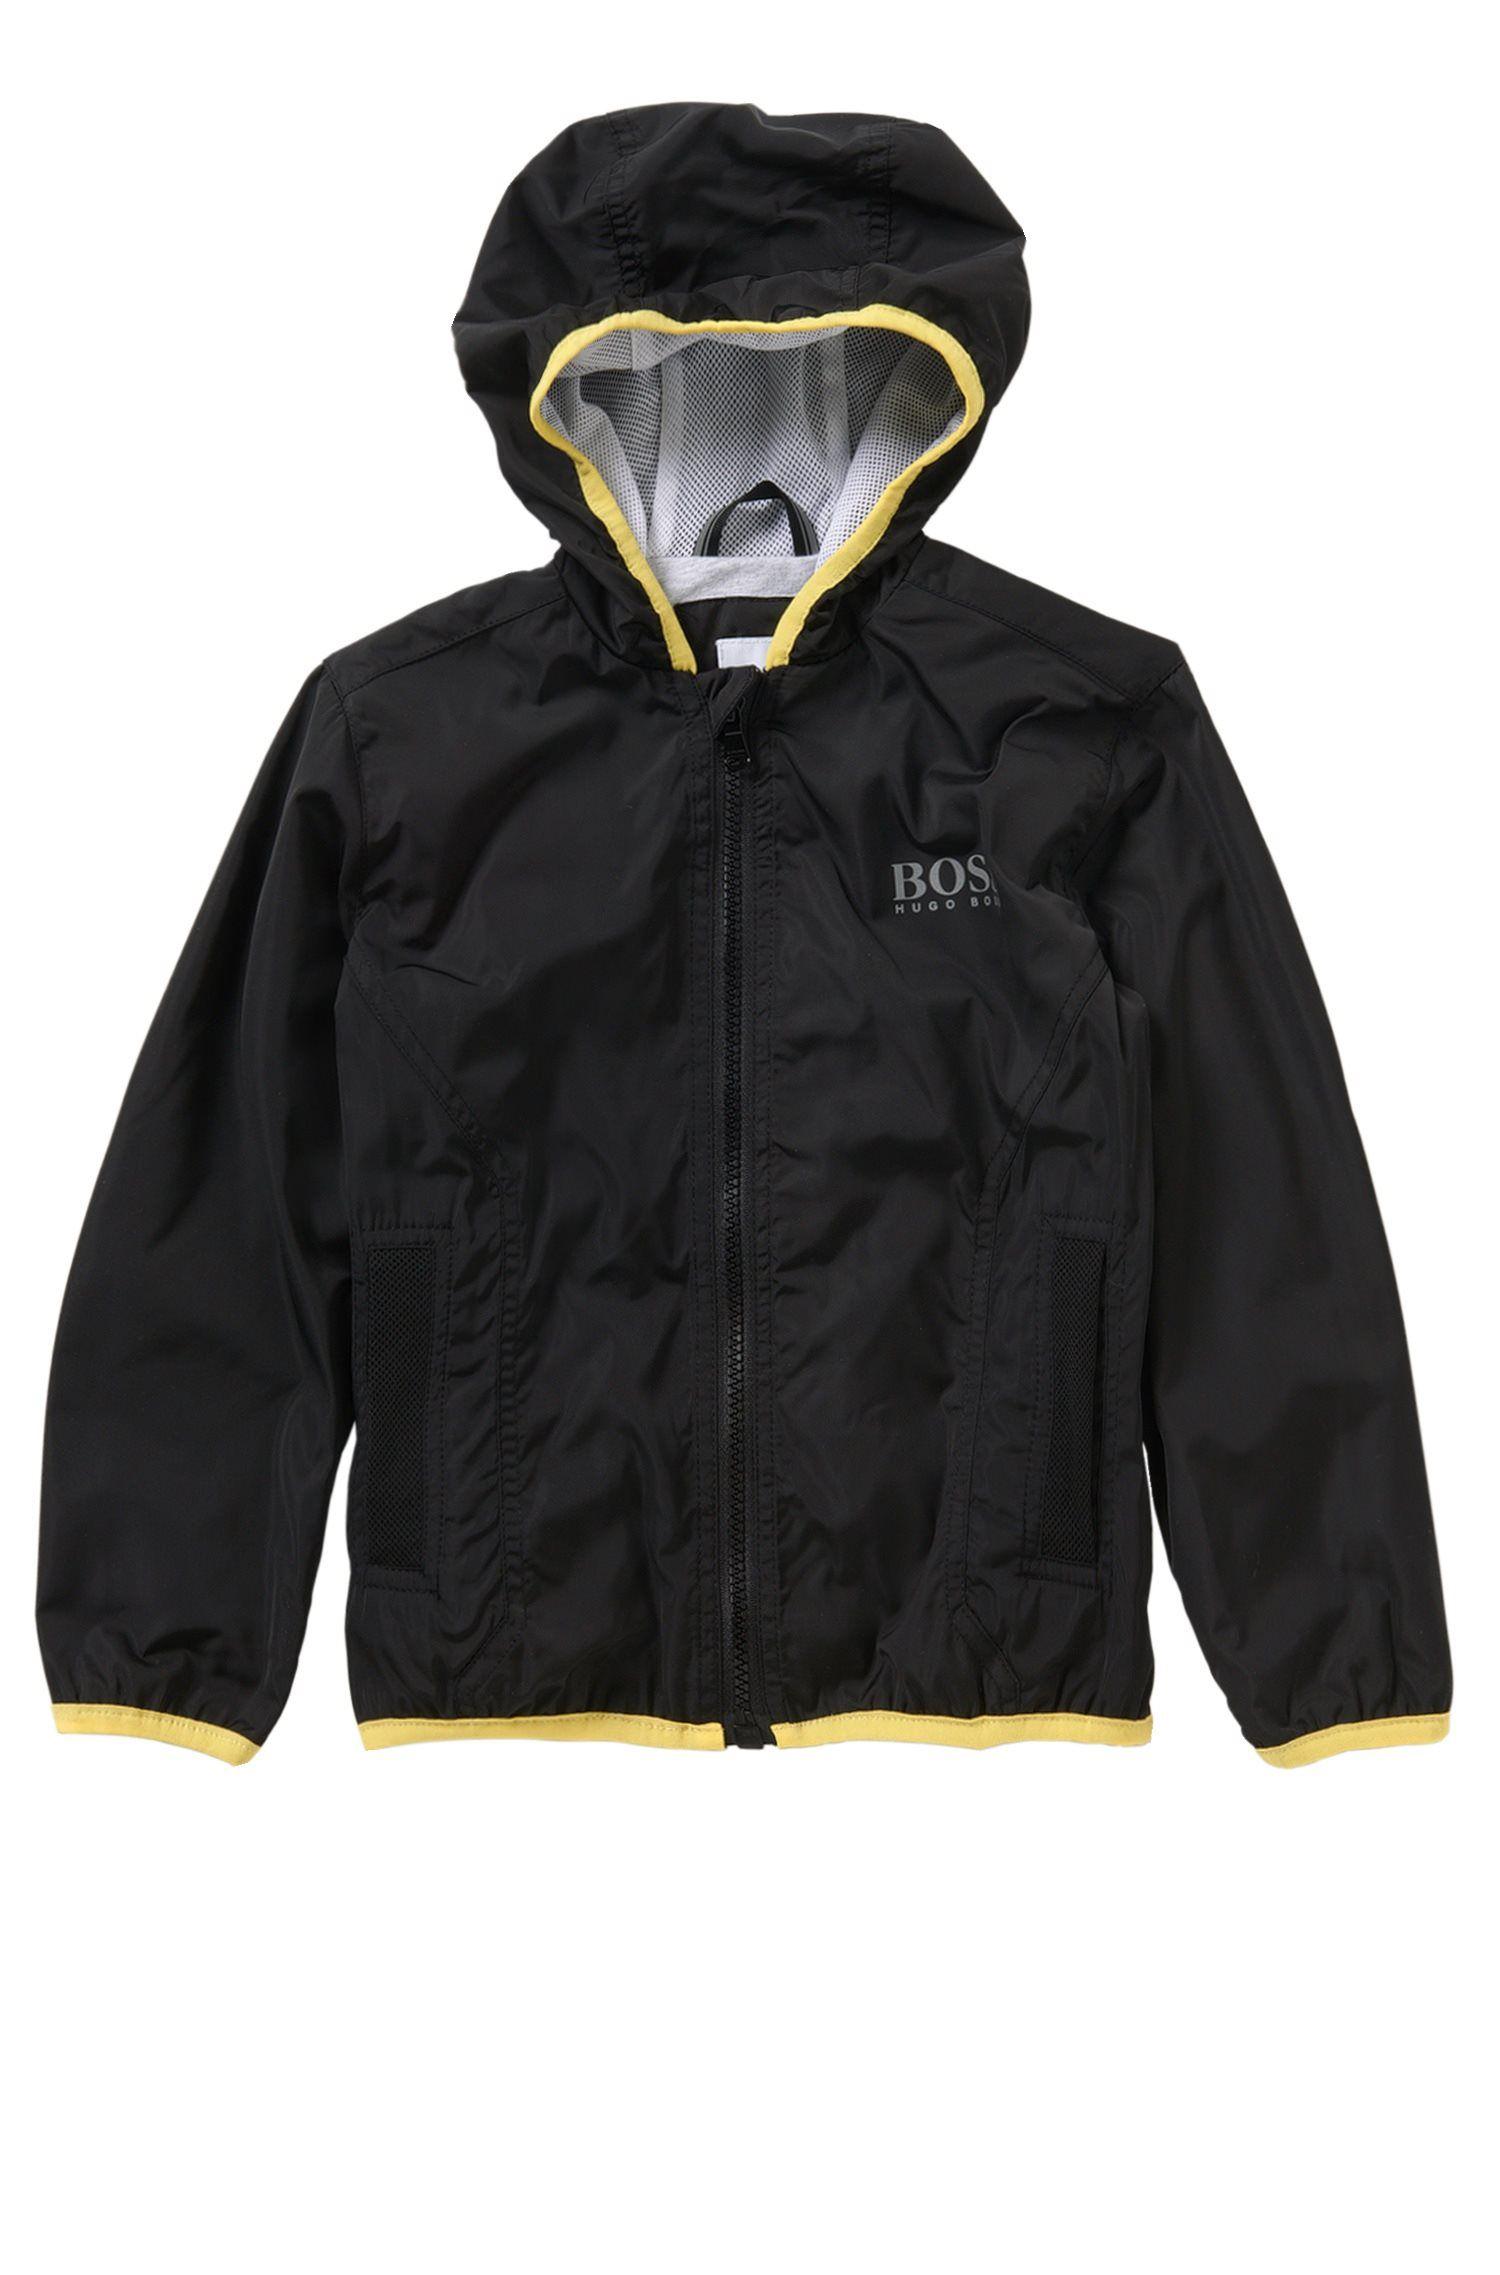 Kids' hooded jacket in stretch cotton blend: 'J26272'